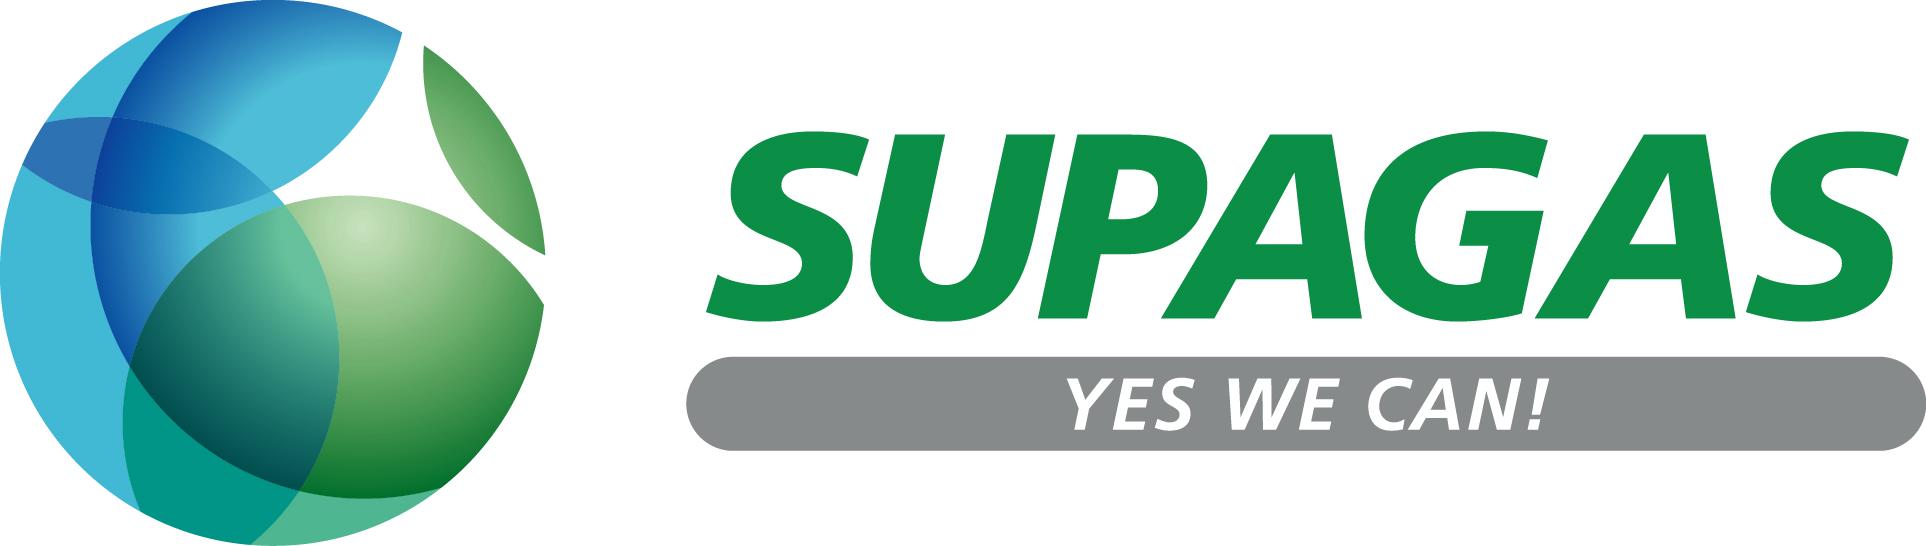 TNSC Supagas Corp Logo.jpg